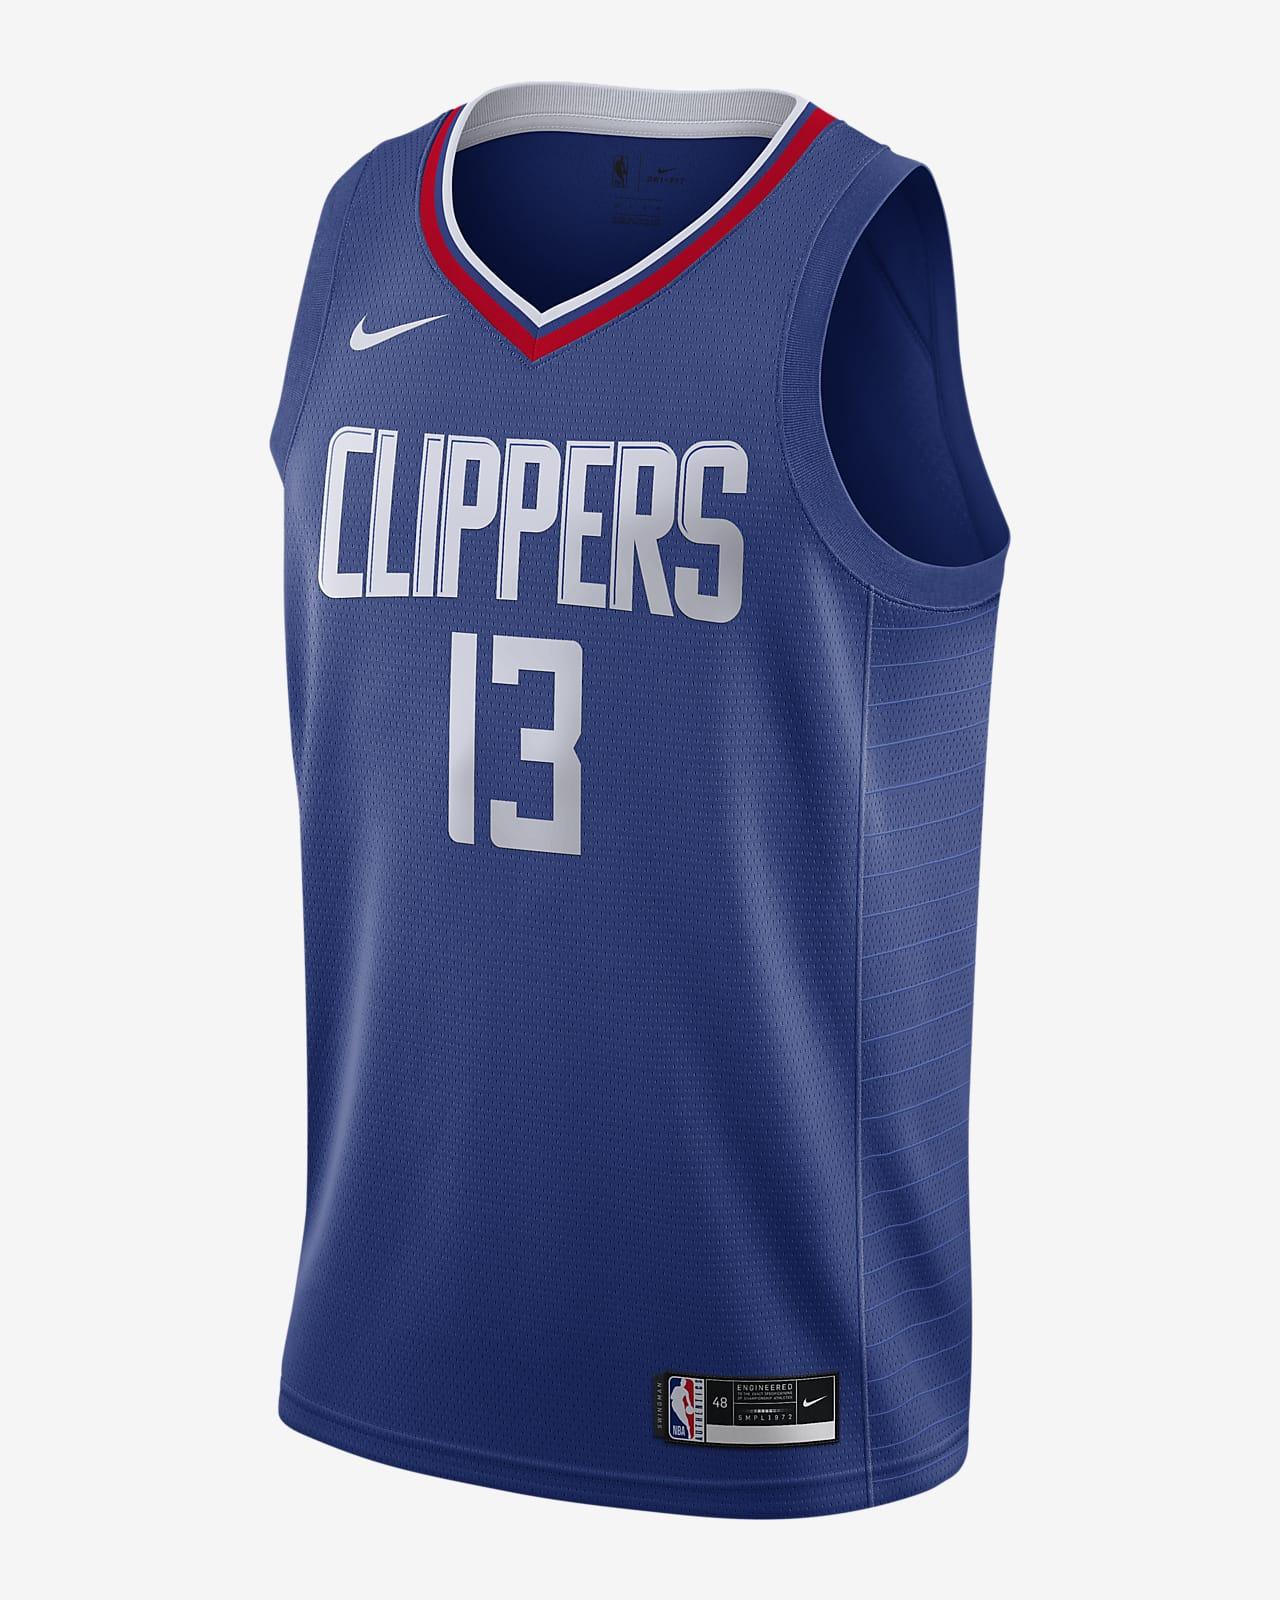 Paul George Clippers Icon Edition 2020 Nike NBA Swingman Jersey